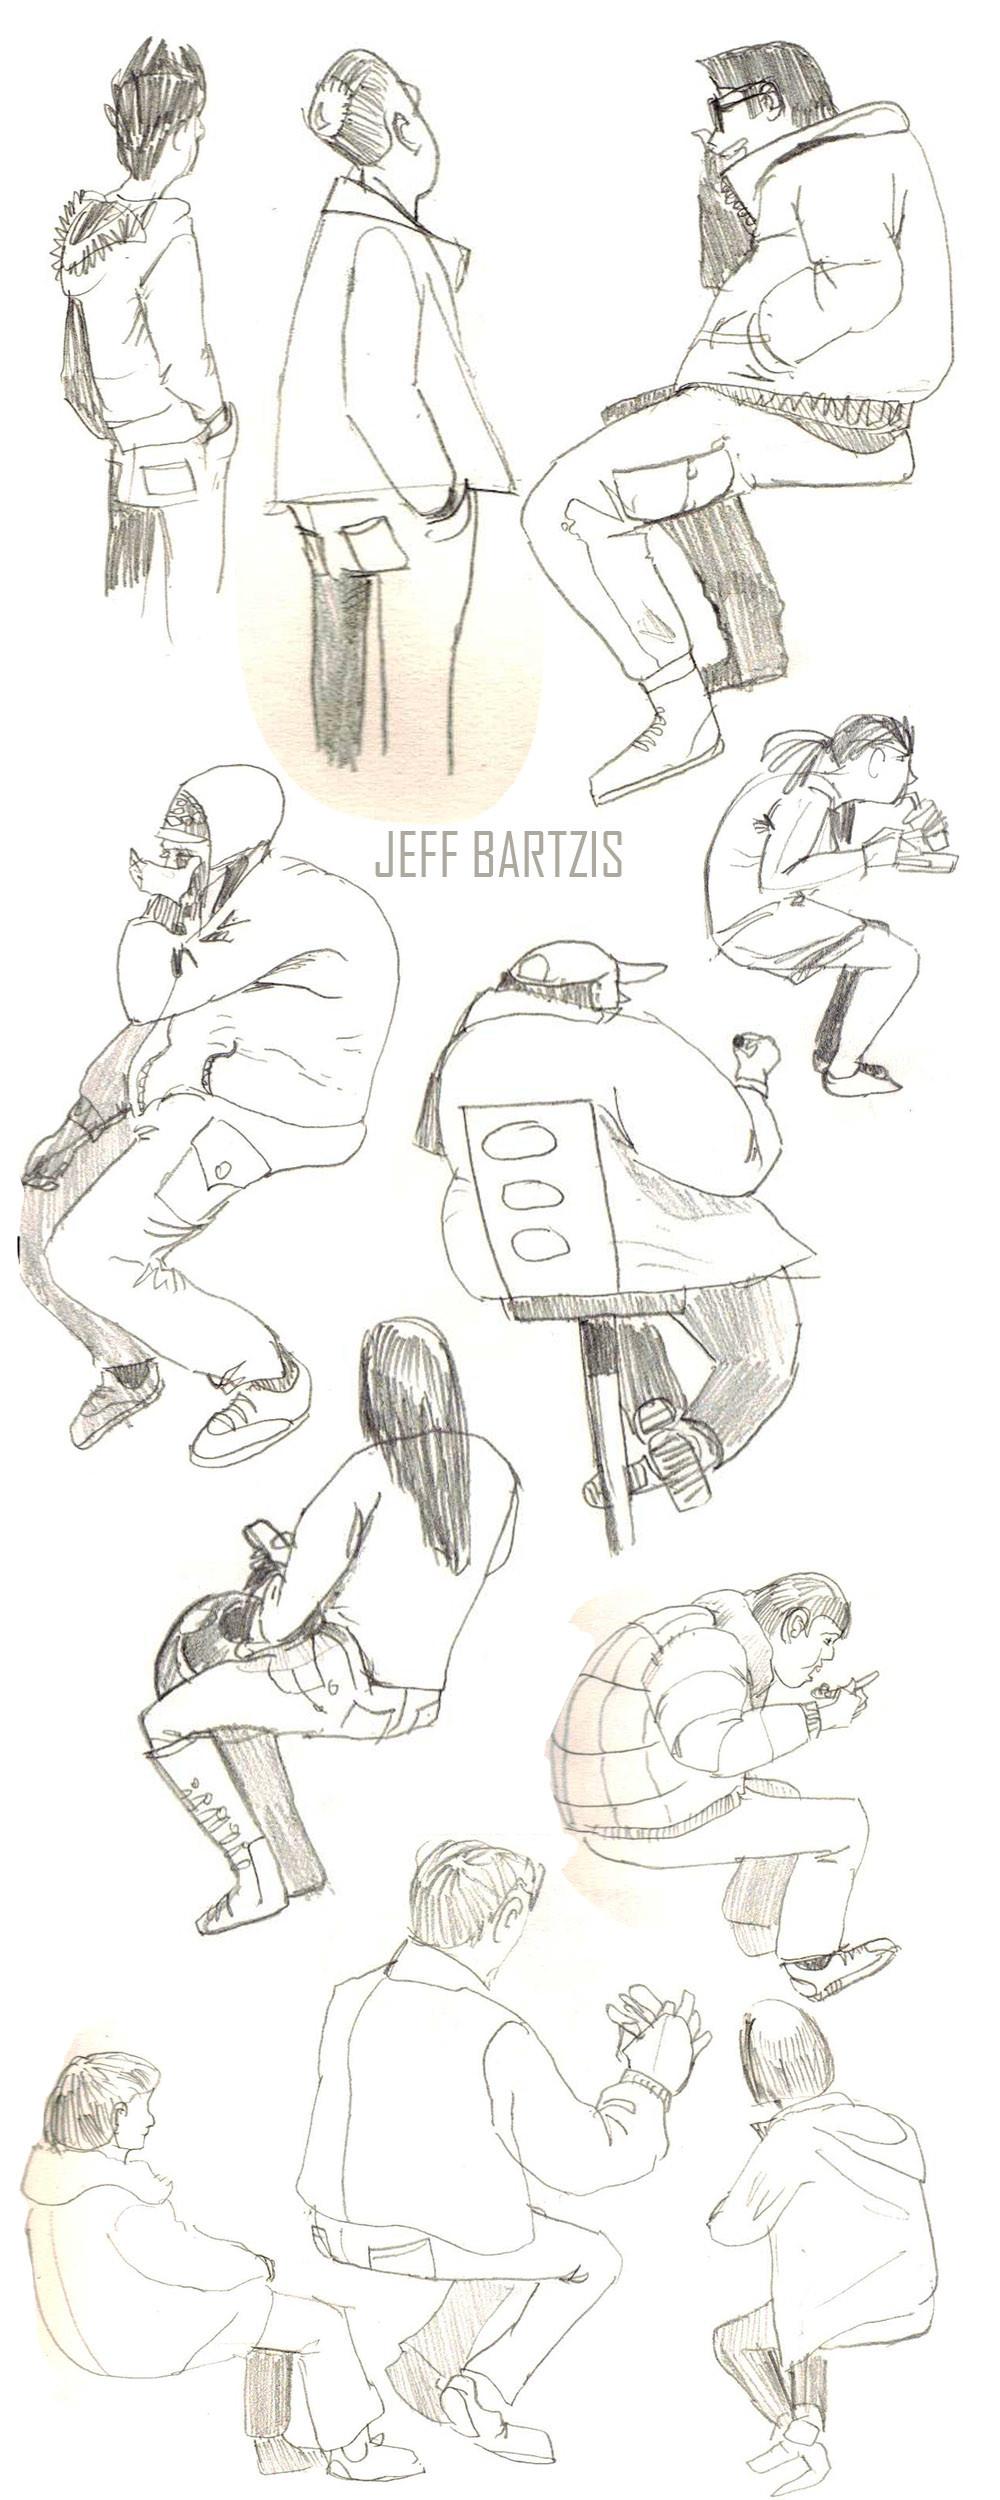 Jeff bartzis sketchbook stuff 040